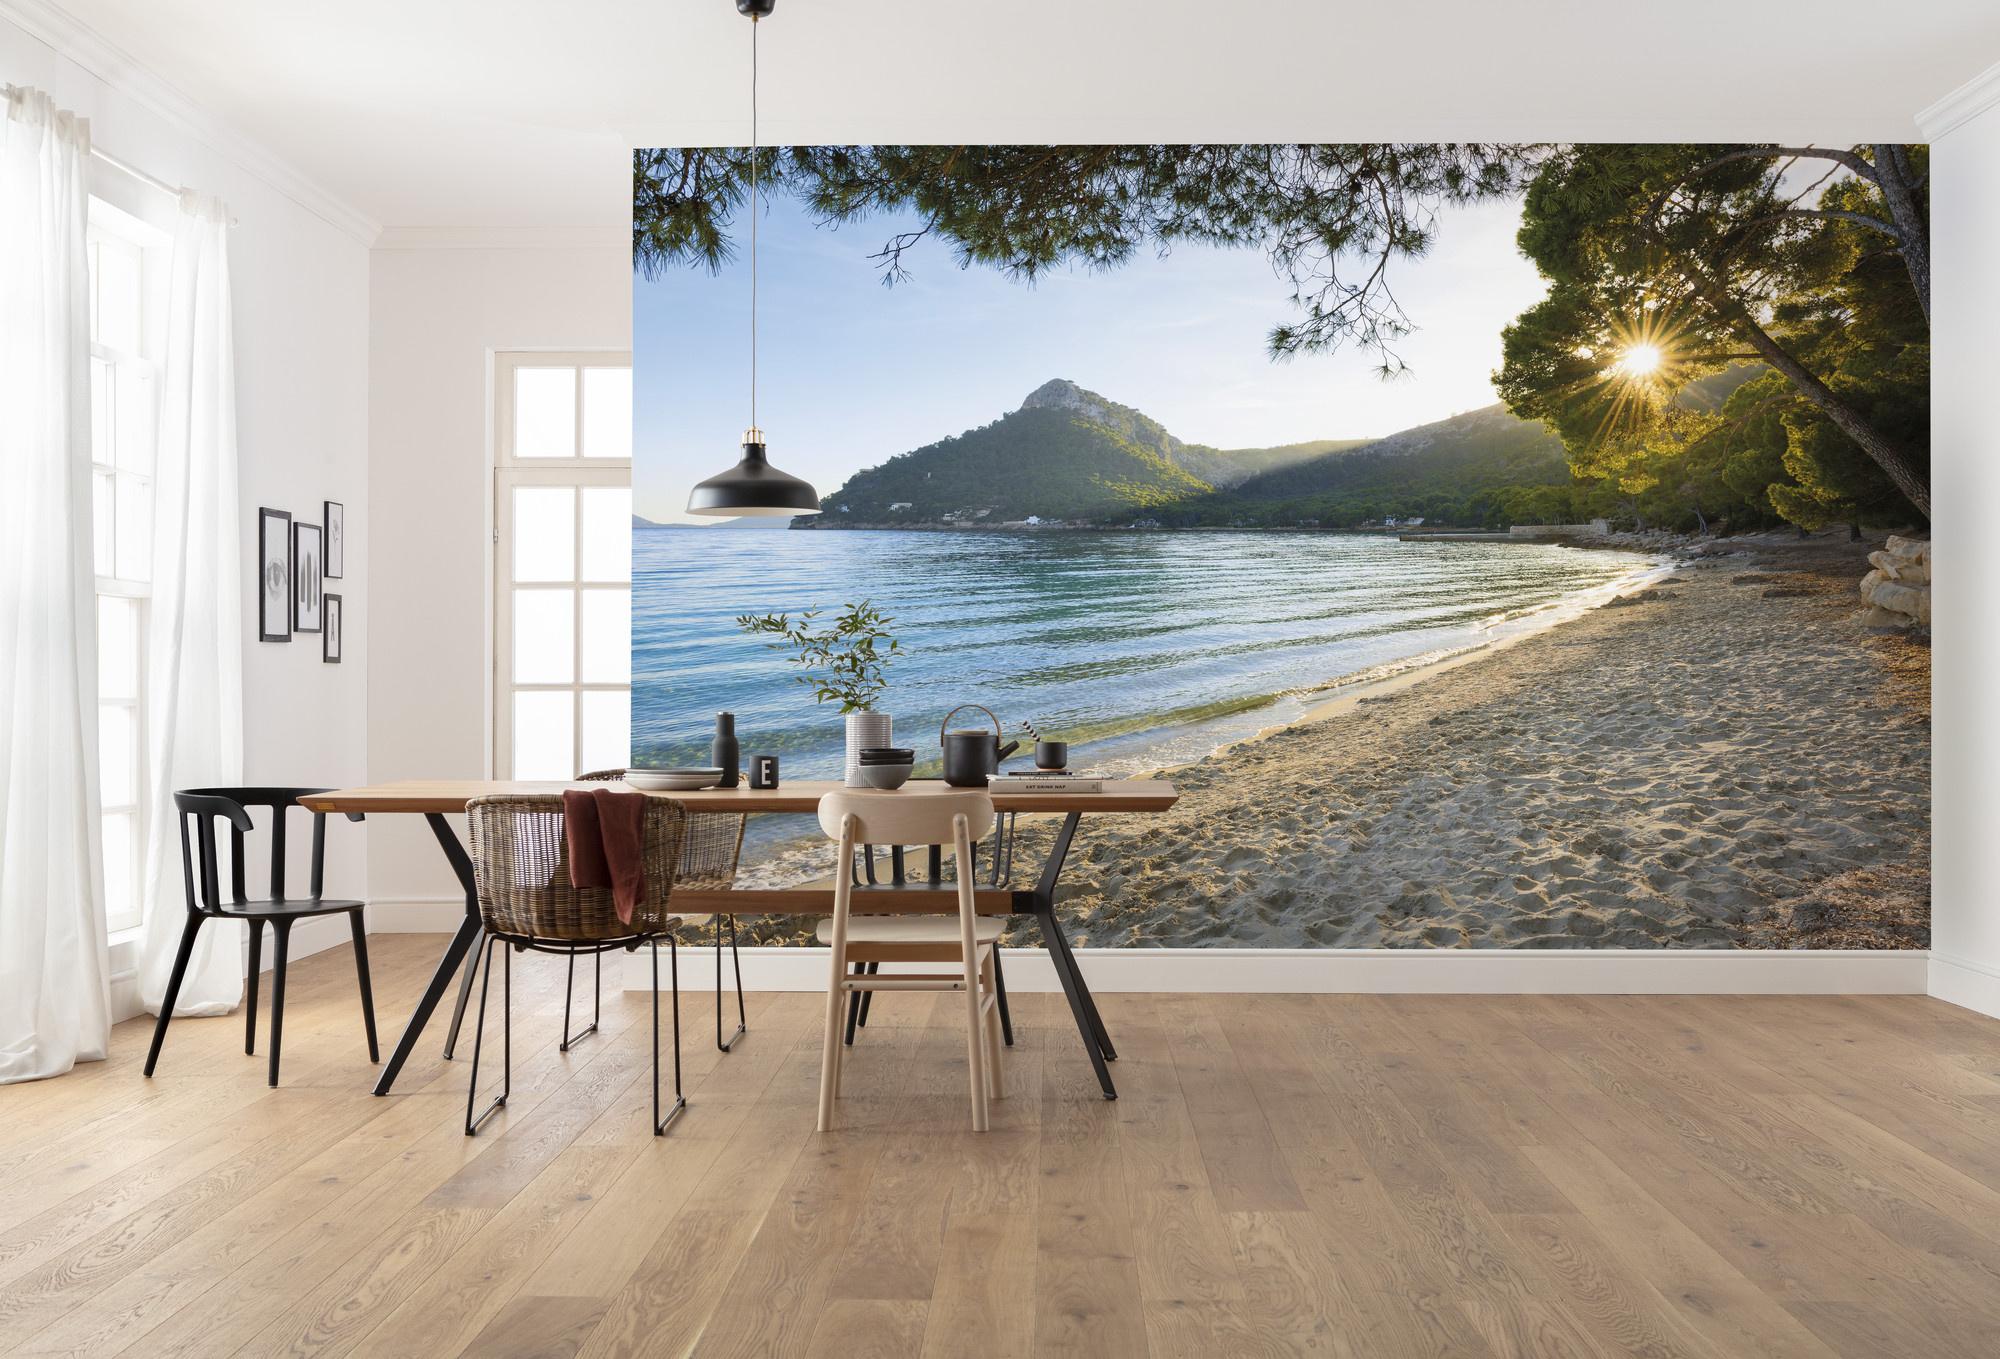 Stefan Hefele Edition 2 Fotobehang Komar - Natuur behang LONELY PARADISE